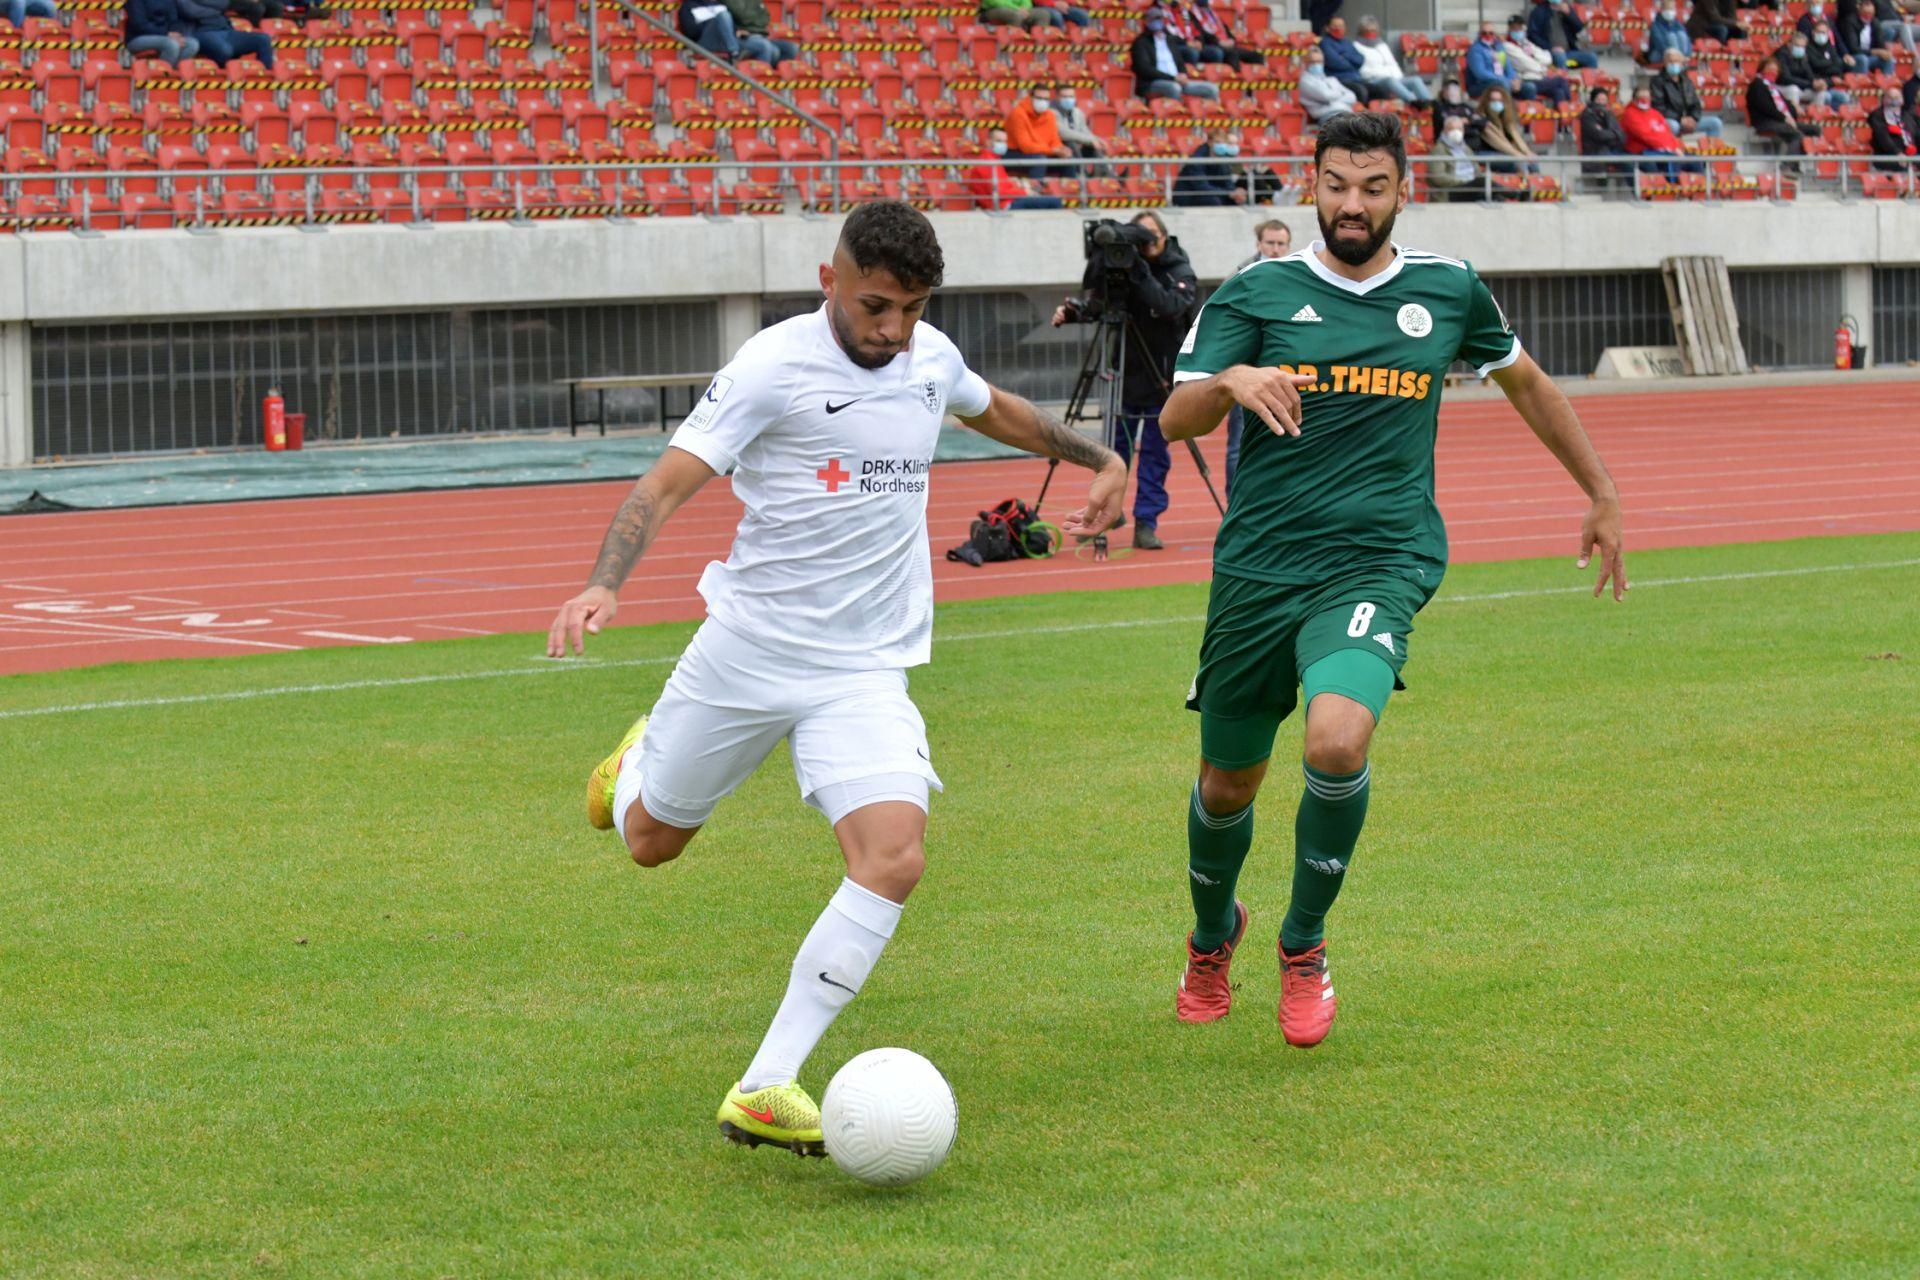 Regionalliga S�dwest 2020/21, KSV Hessen Kassel, FC 08 Homburg, Endstand 0:1